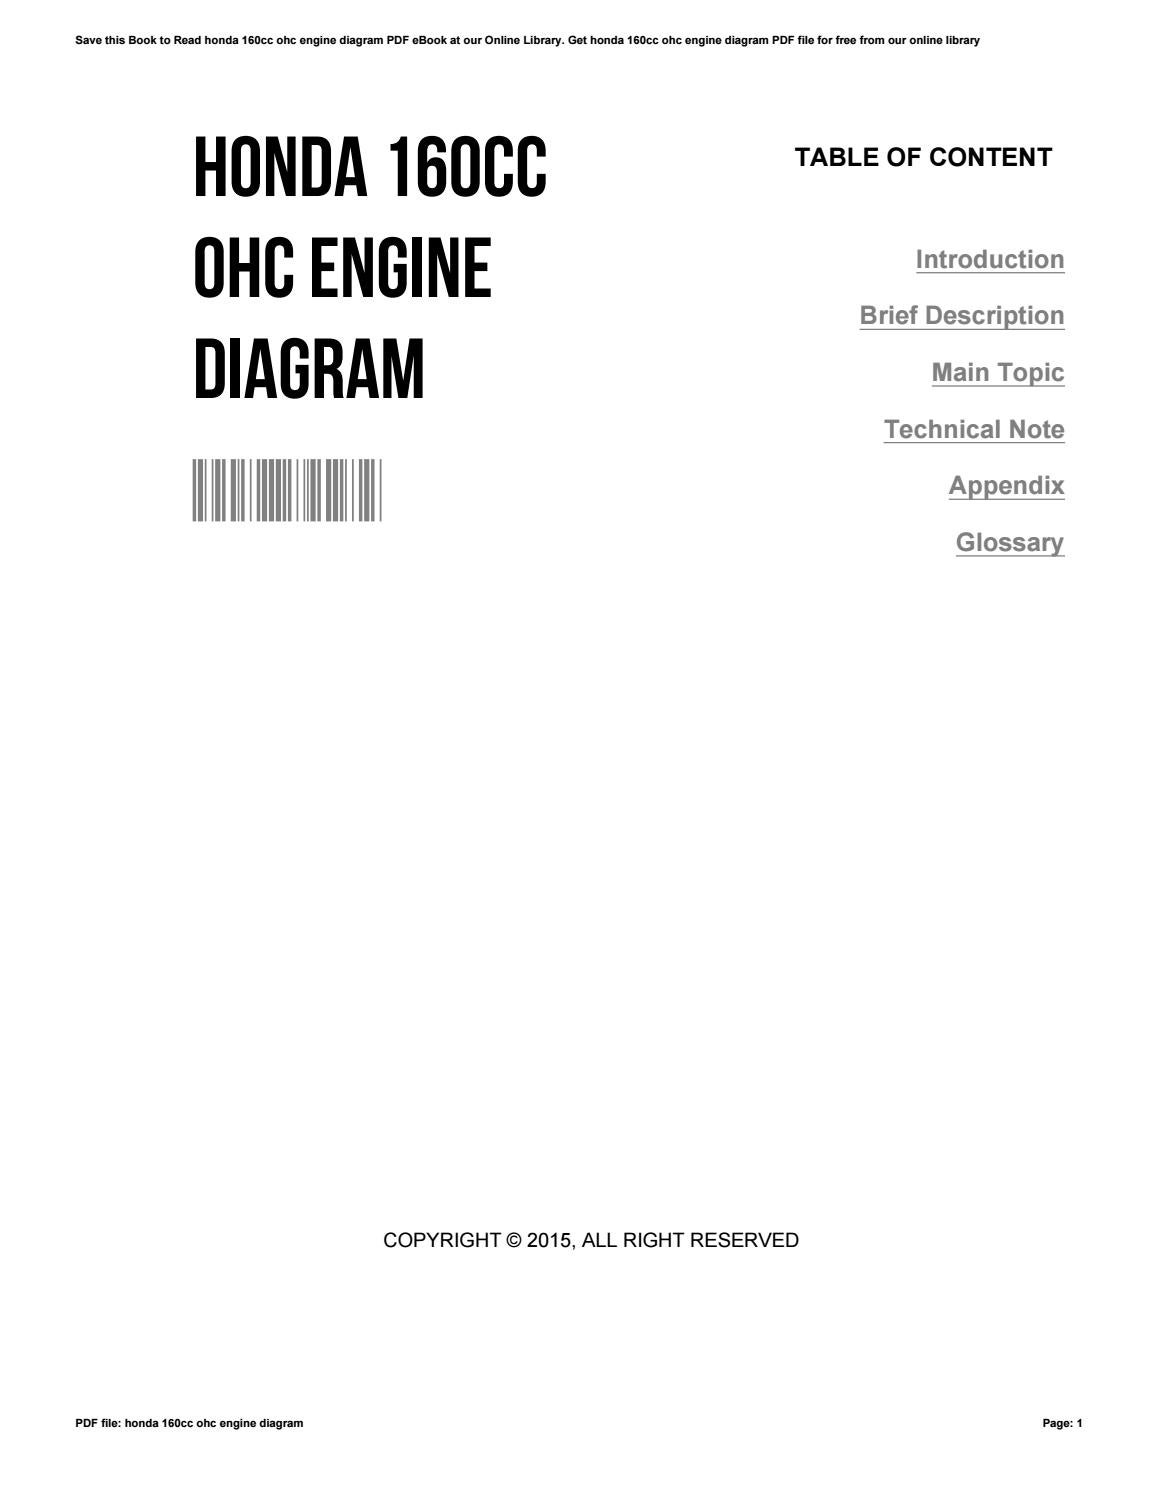 Honda 160cc Ohc Engine Diagram By Deborastone2494